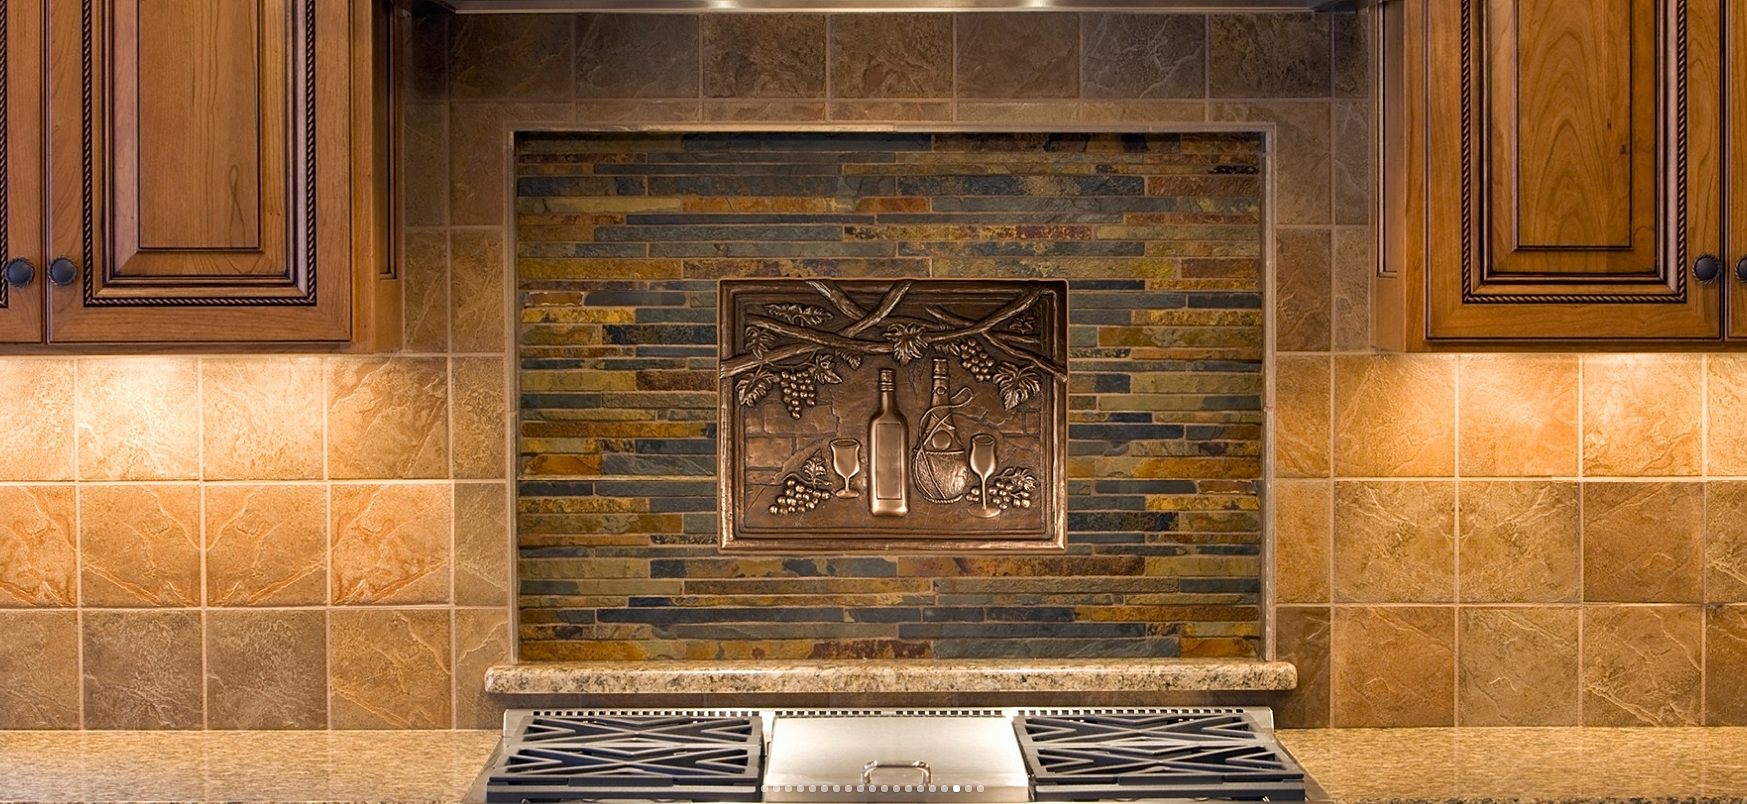 slate kitchen backsplash amazing slate backsplash kitchen peel mysite slate kitchen backsplash